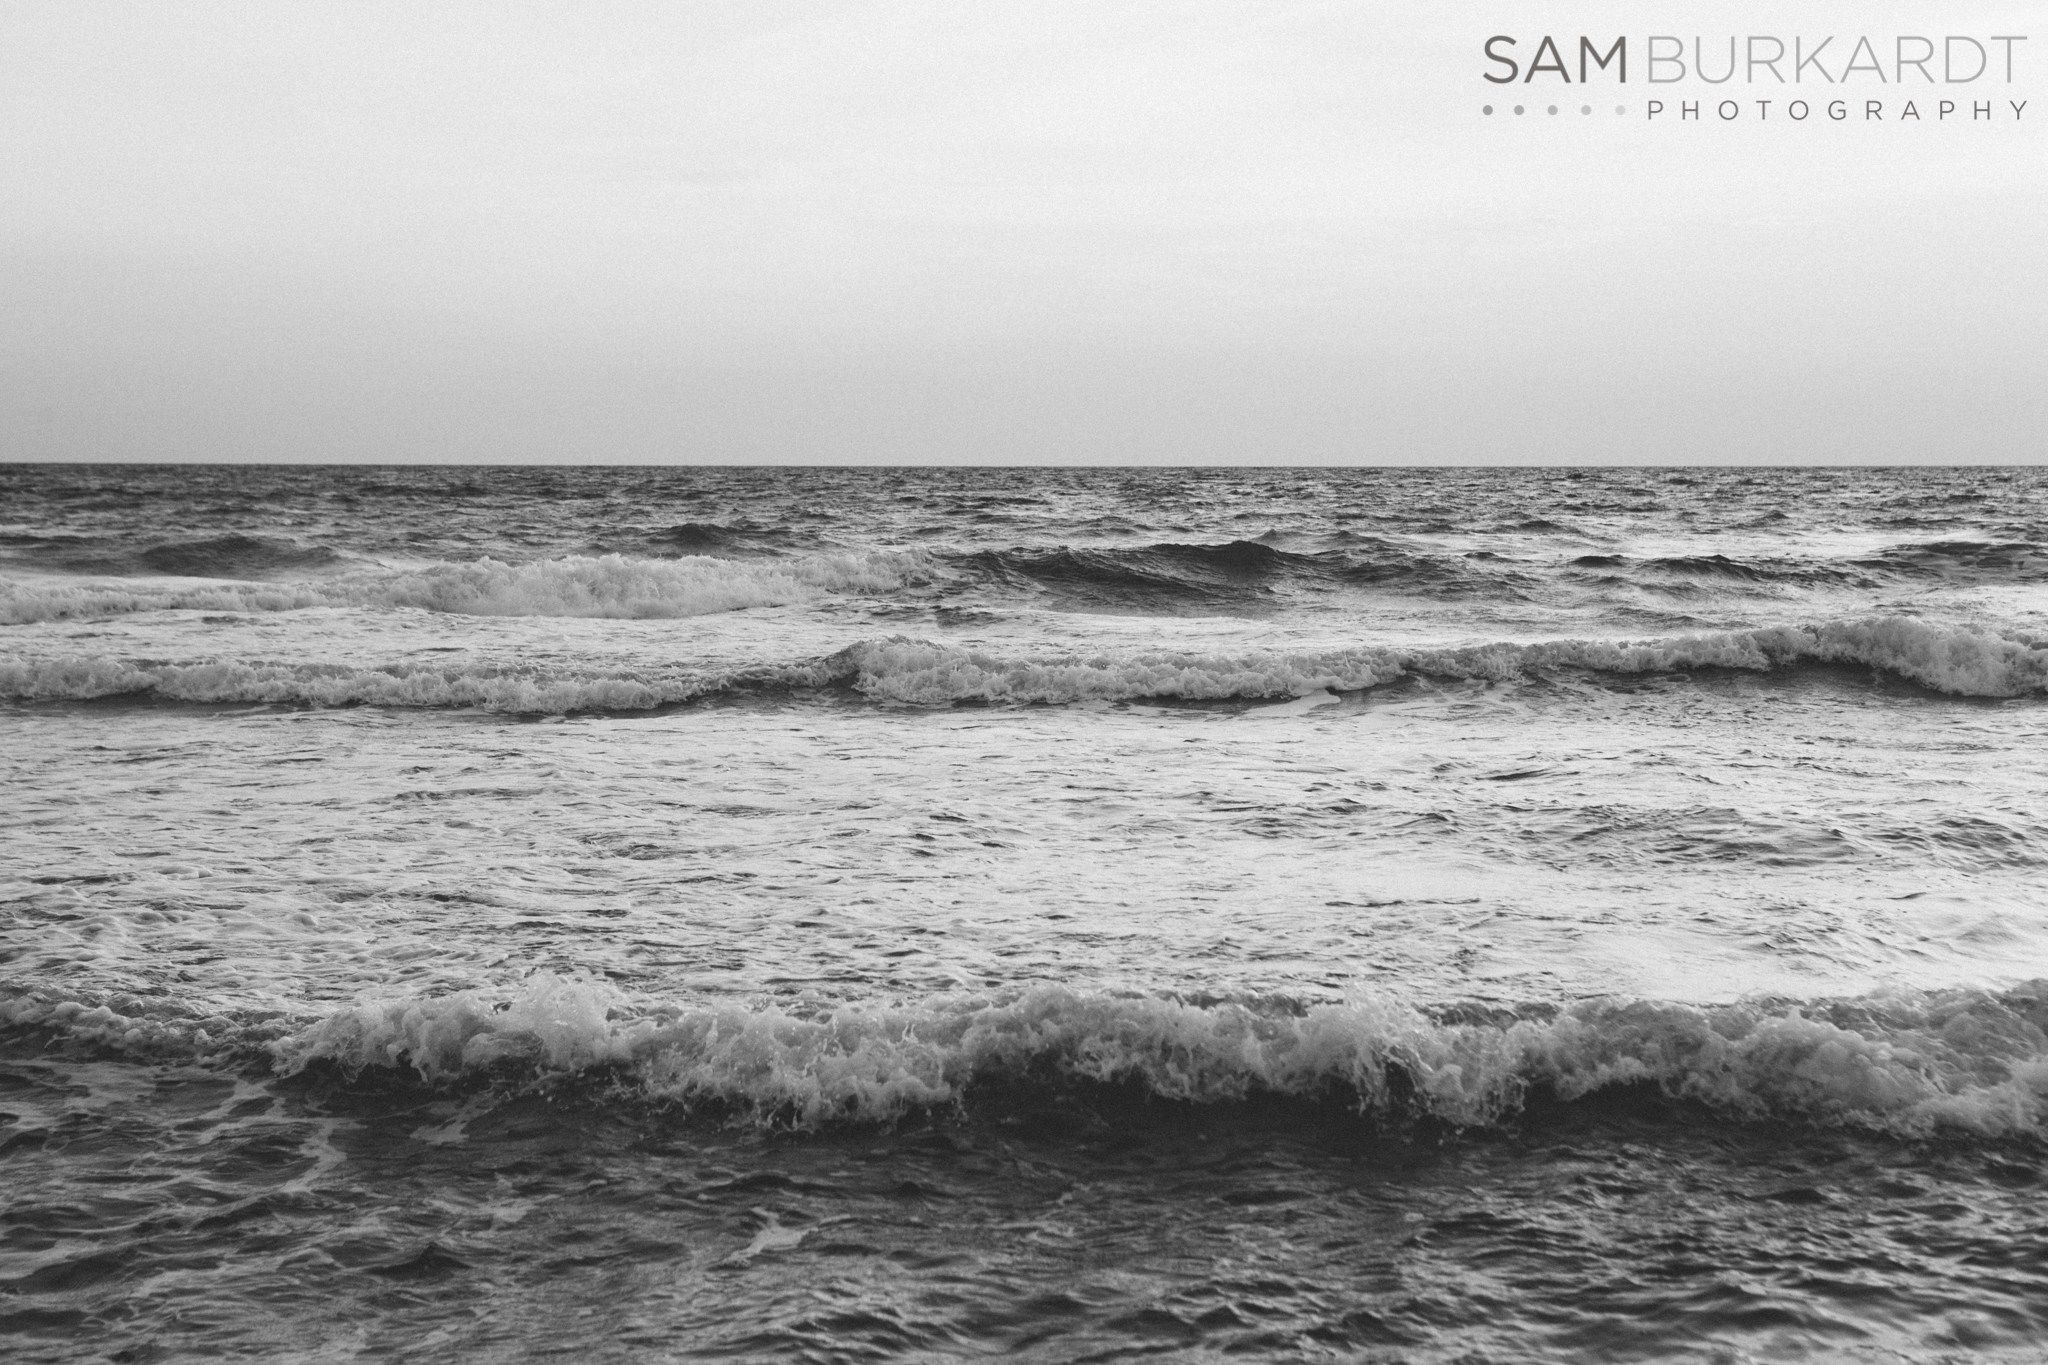 samburkardt_engagement_vacation_beach_cape_san_blas_florida_camping_gopro_0035.jpg